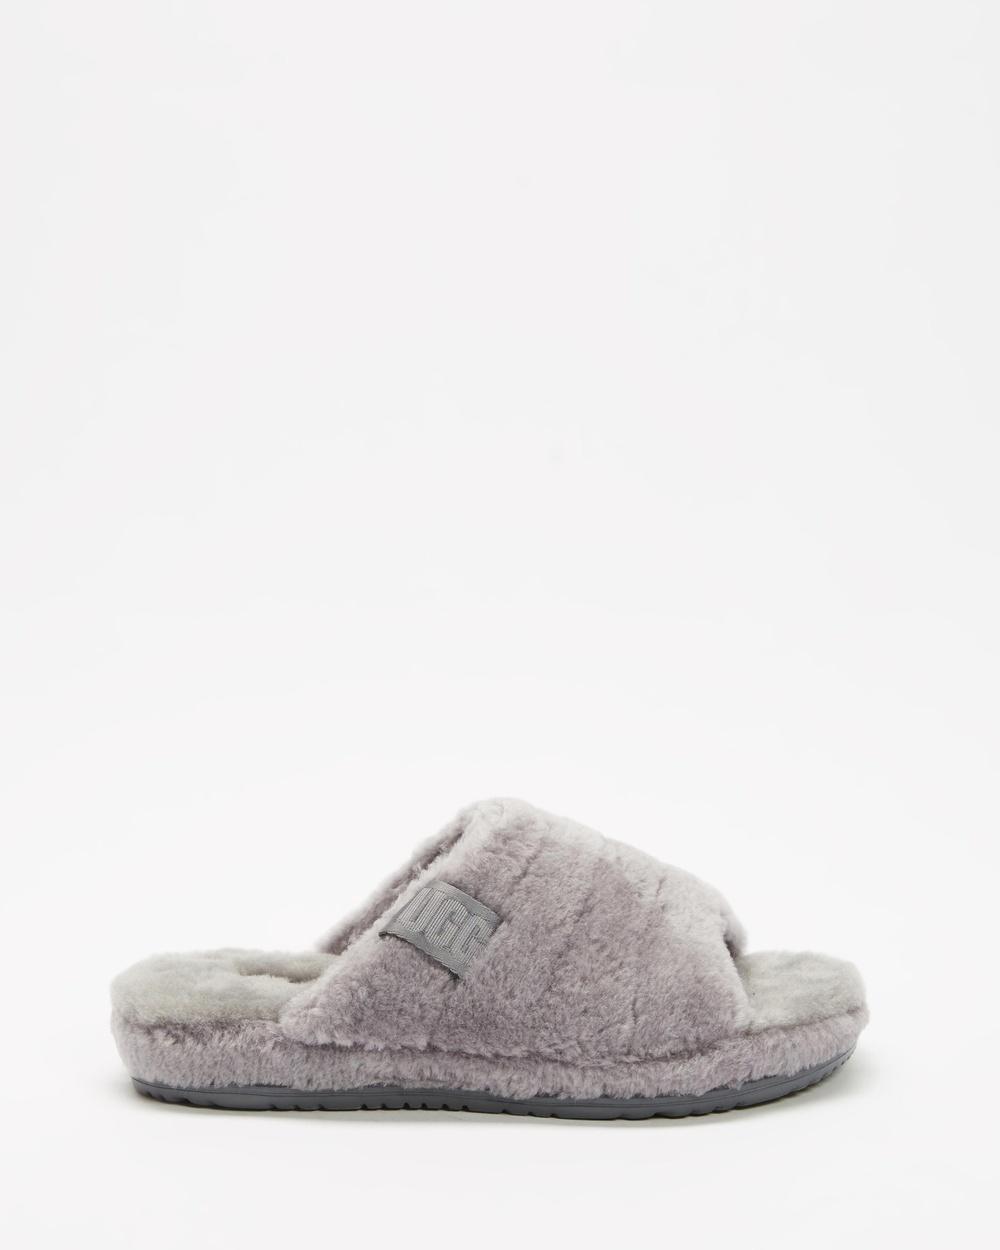 UGG Fluff You Slides Men's Slippers & Accessories Metal